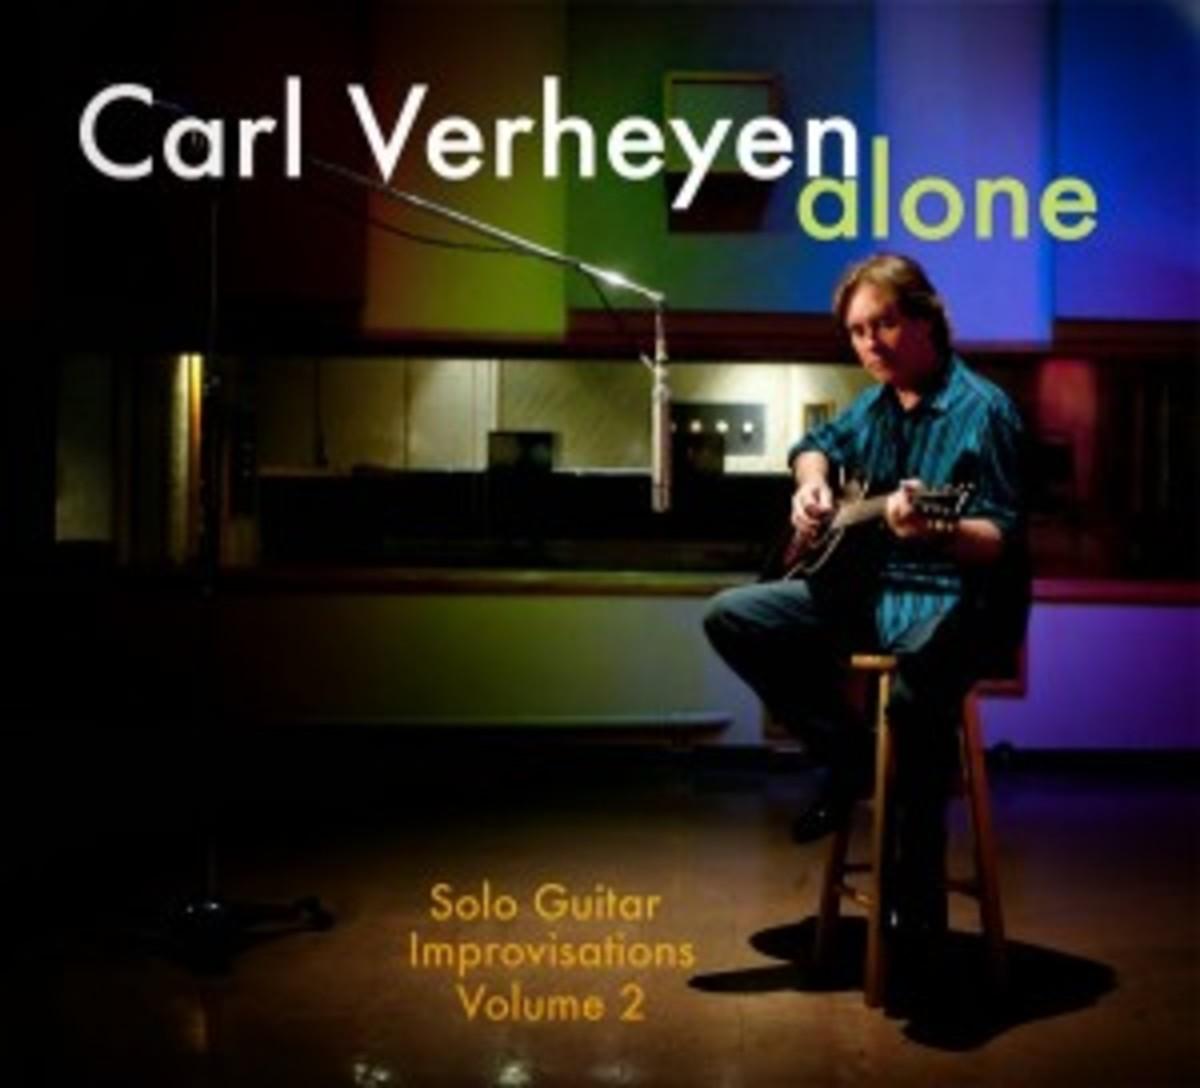 CV-ALONE-cover-medium